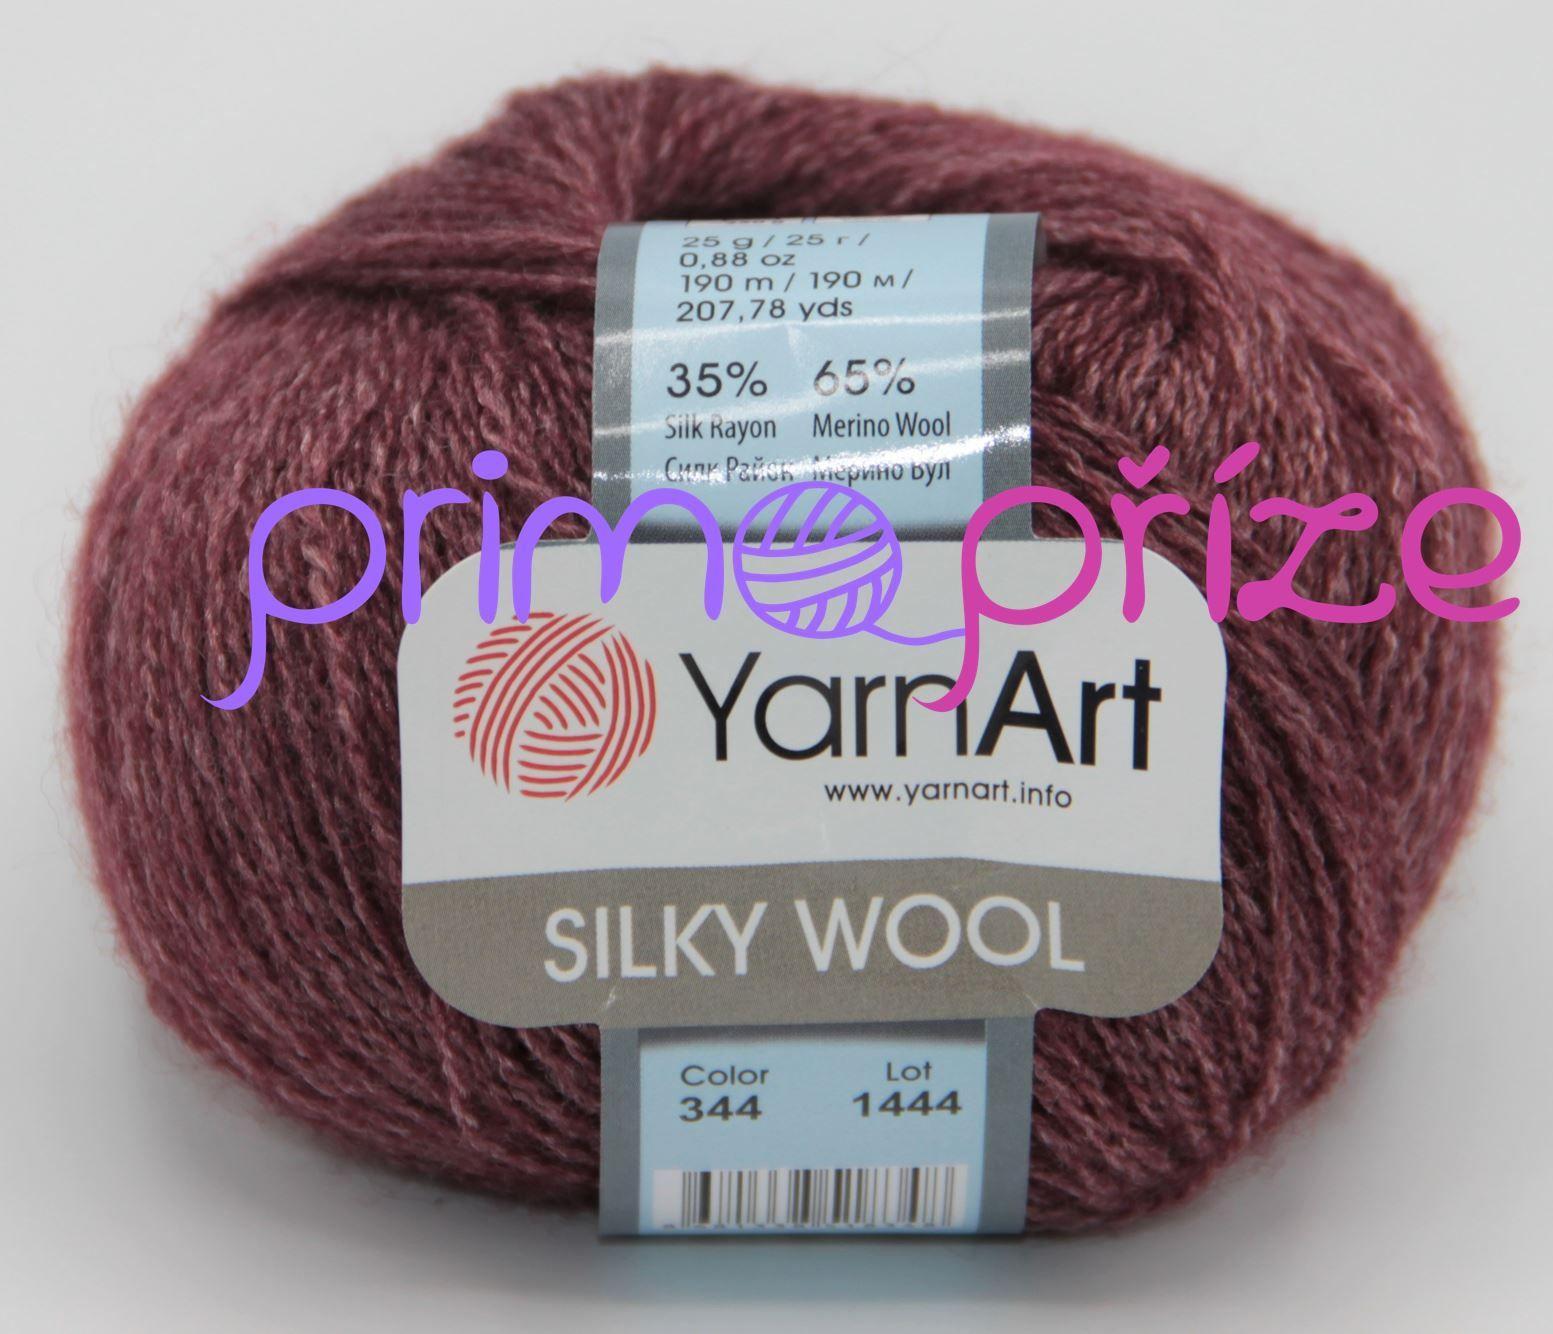 YarnArt Silky Wool 344 bordo